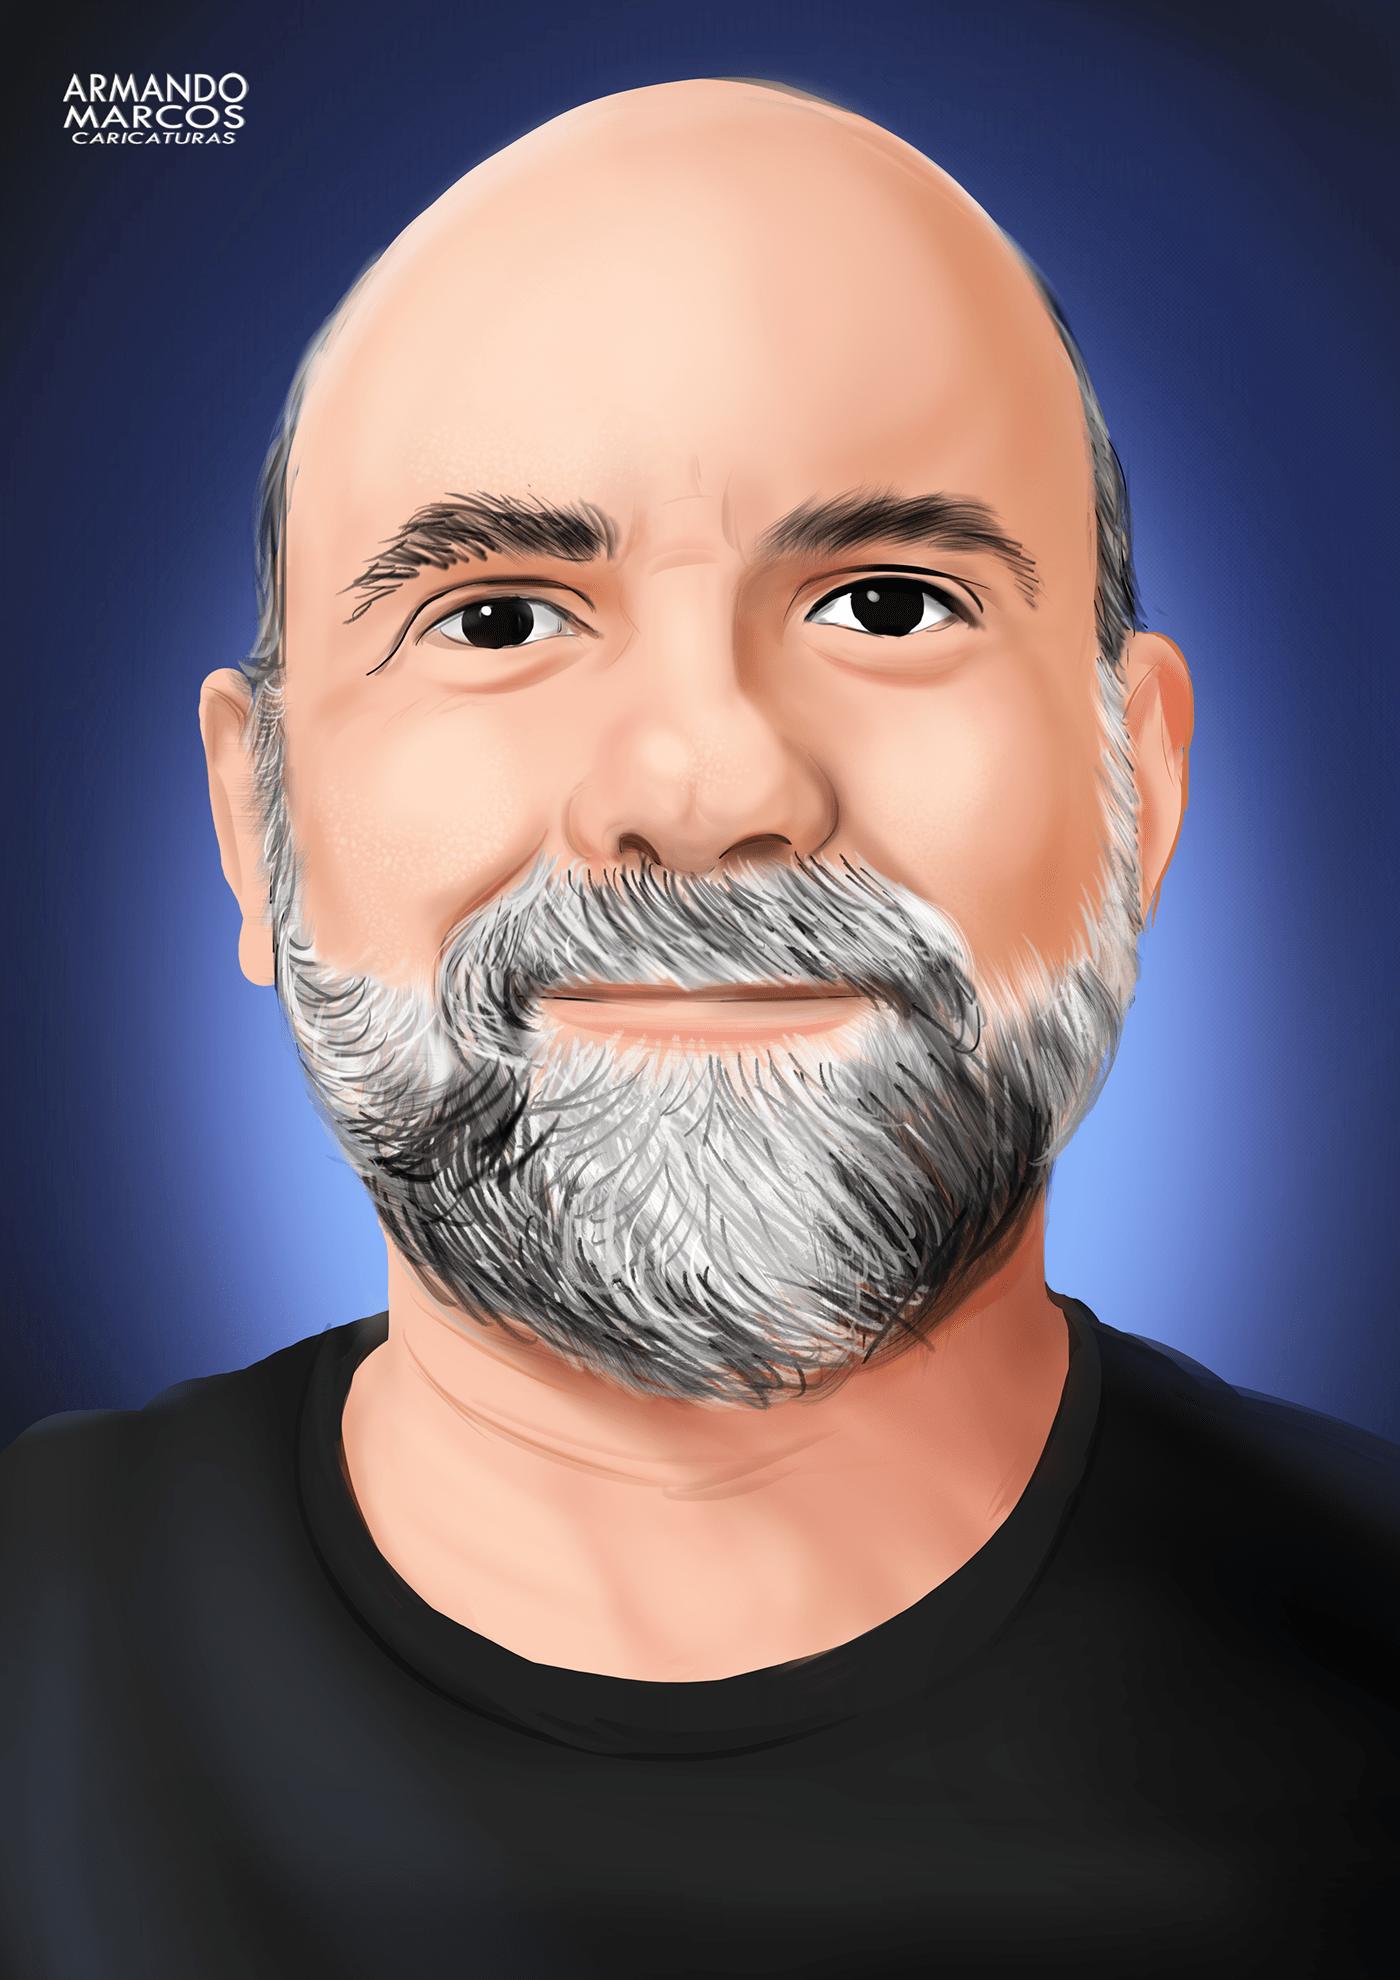 #historianaocontada artdigital caricature   digitalart digitalportrait ilustration paulorezzutti